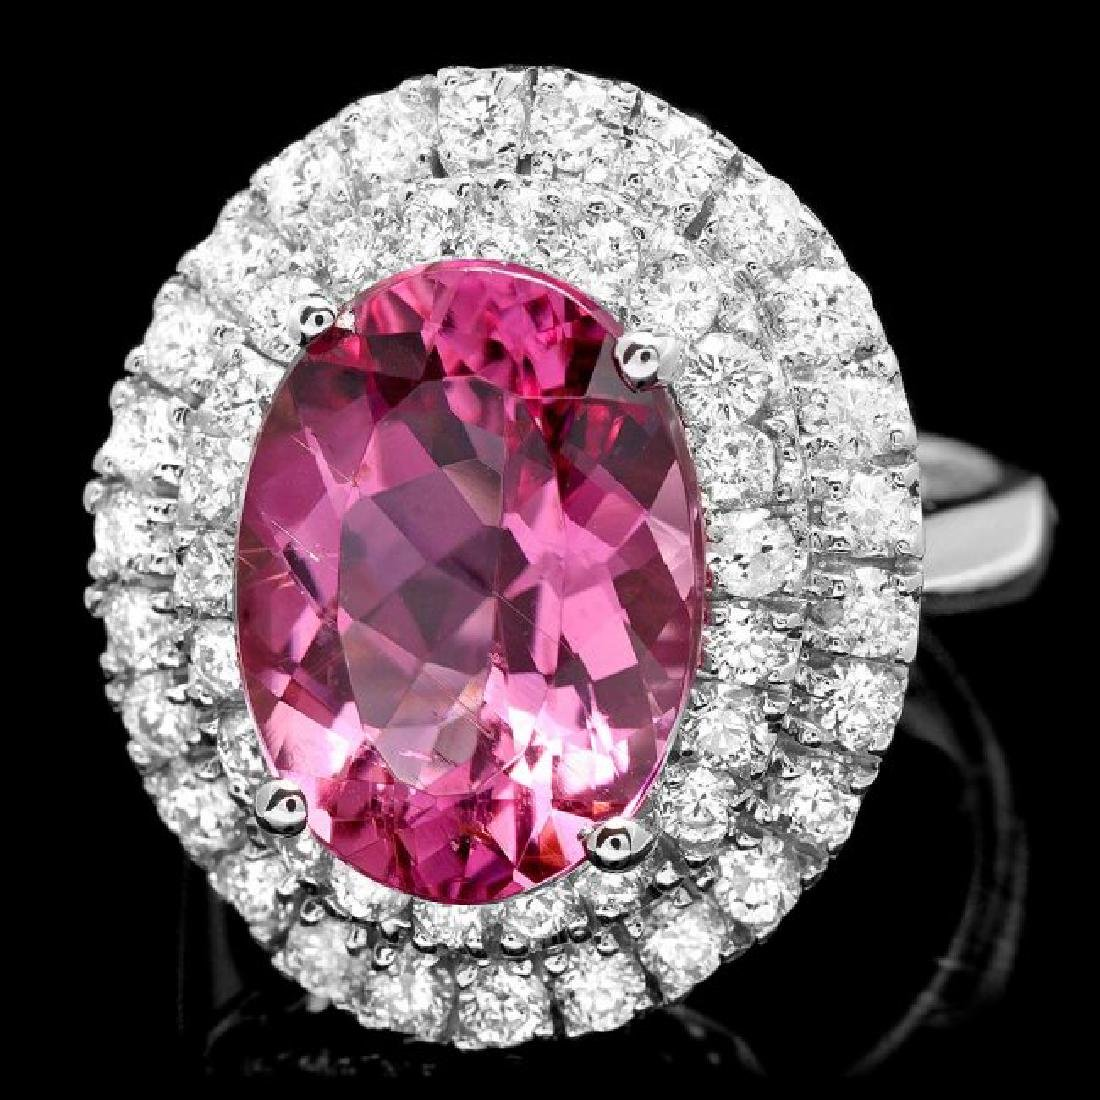 14k Gold 6.55ct Tourmaline 1.45ct Diamond Ring